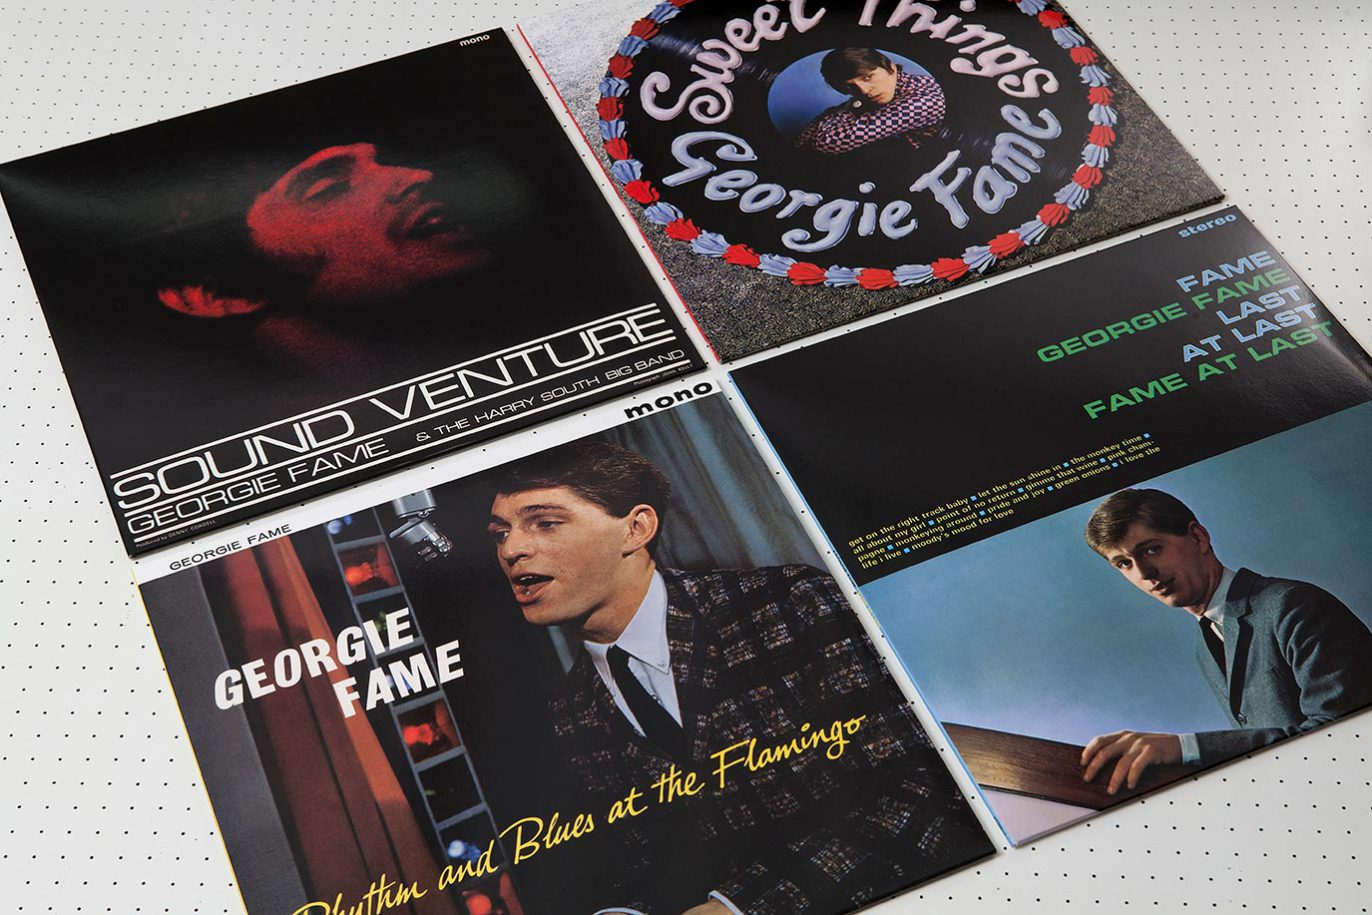 georgie-fame_vinyl-05